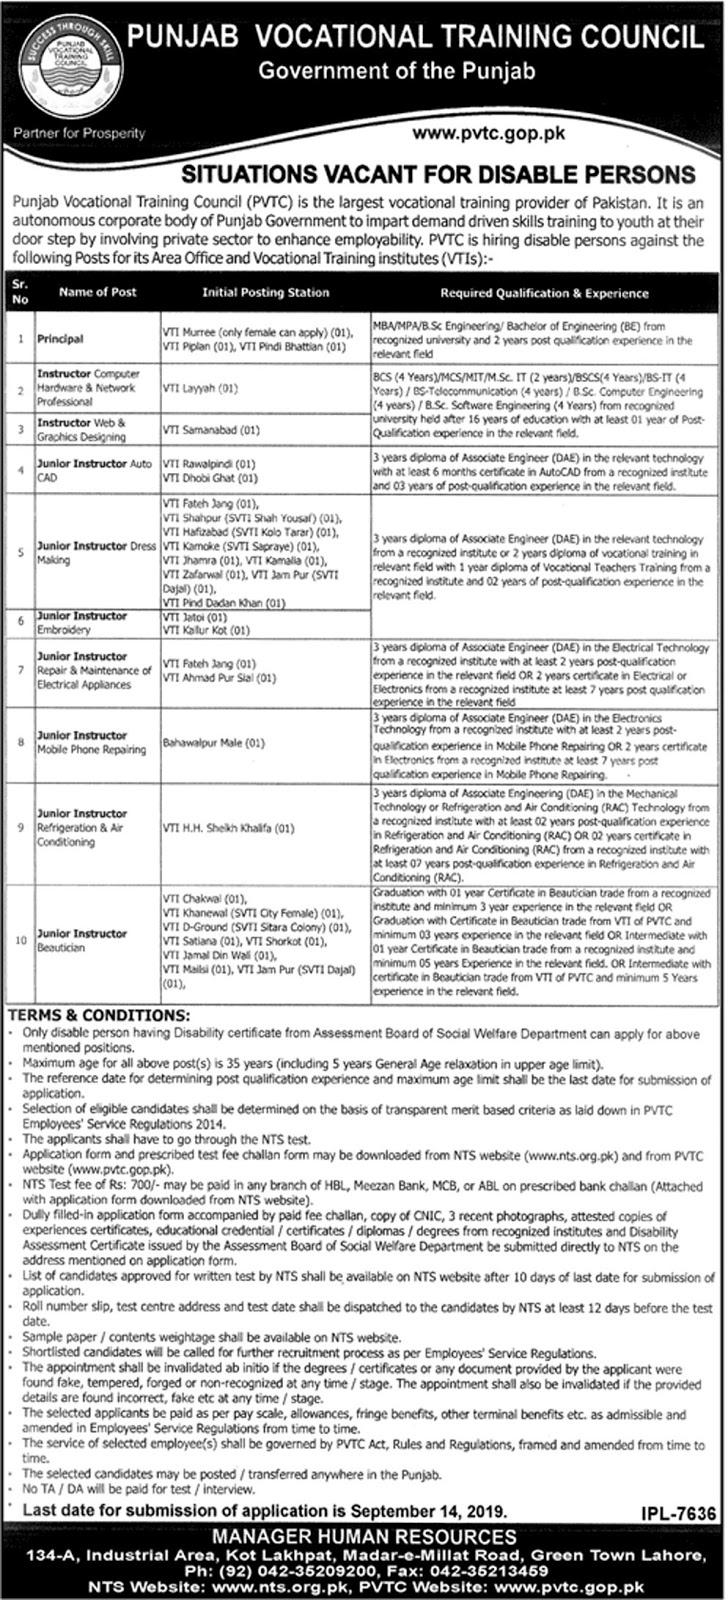 Punjab Vocational Training Council (PVTC) Jobs 2019 NTS Download Application Form